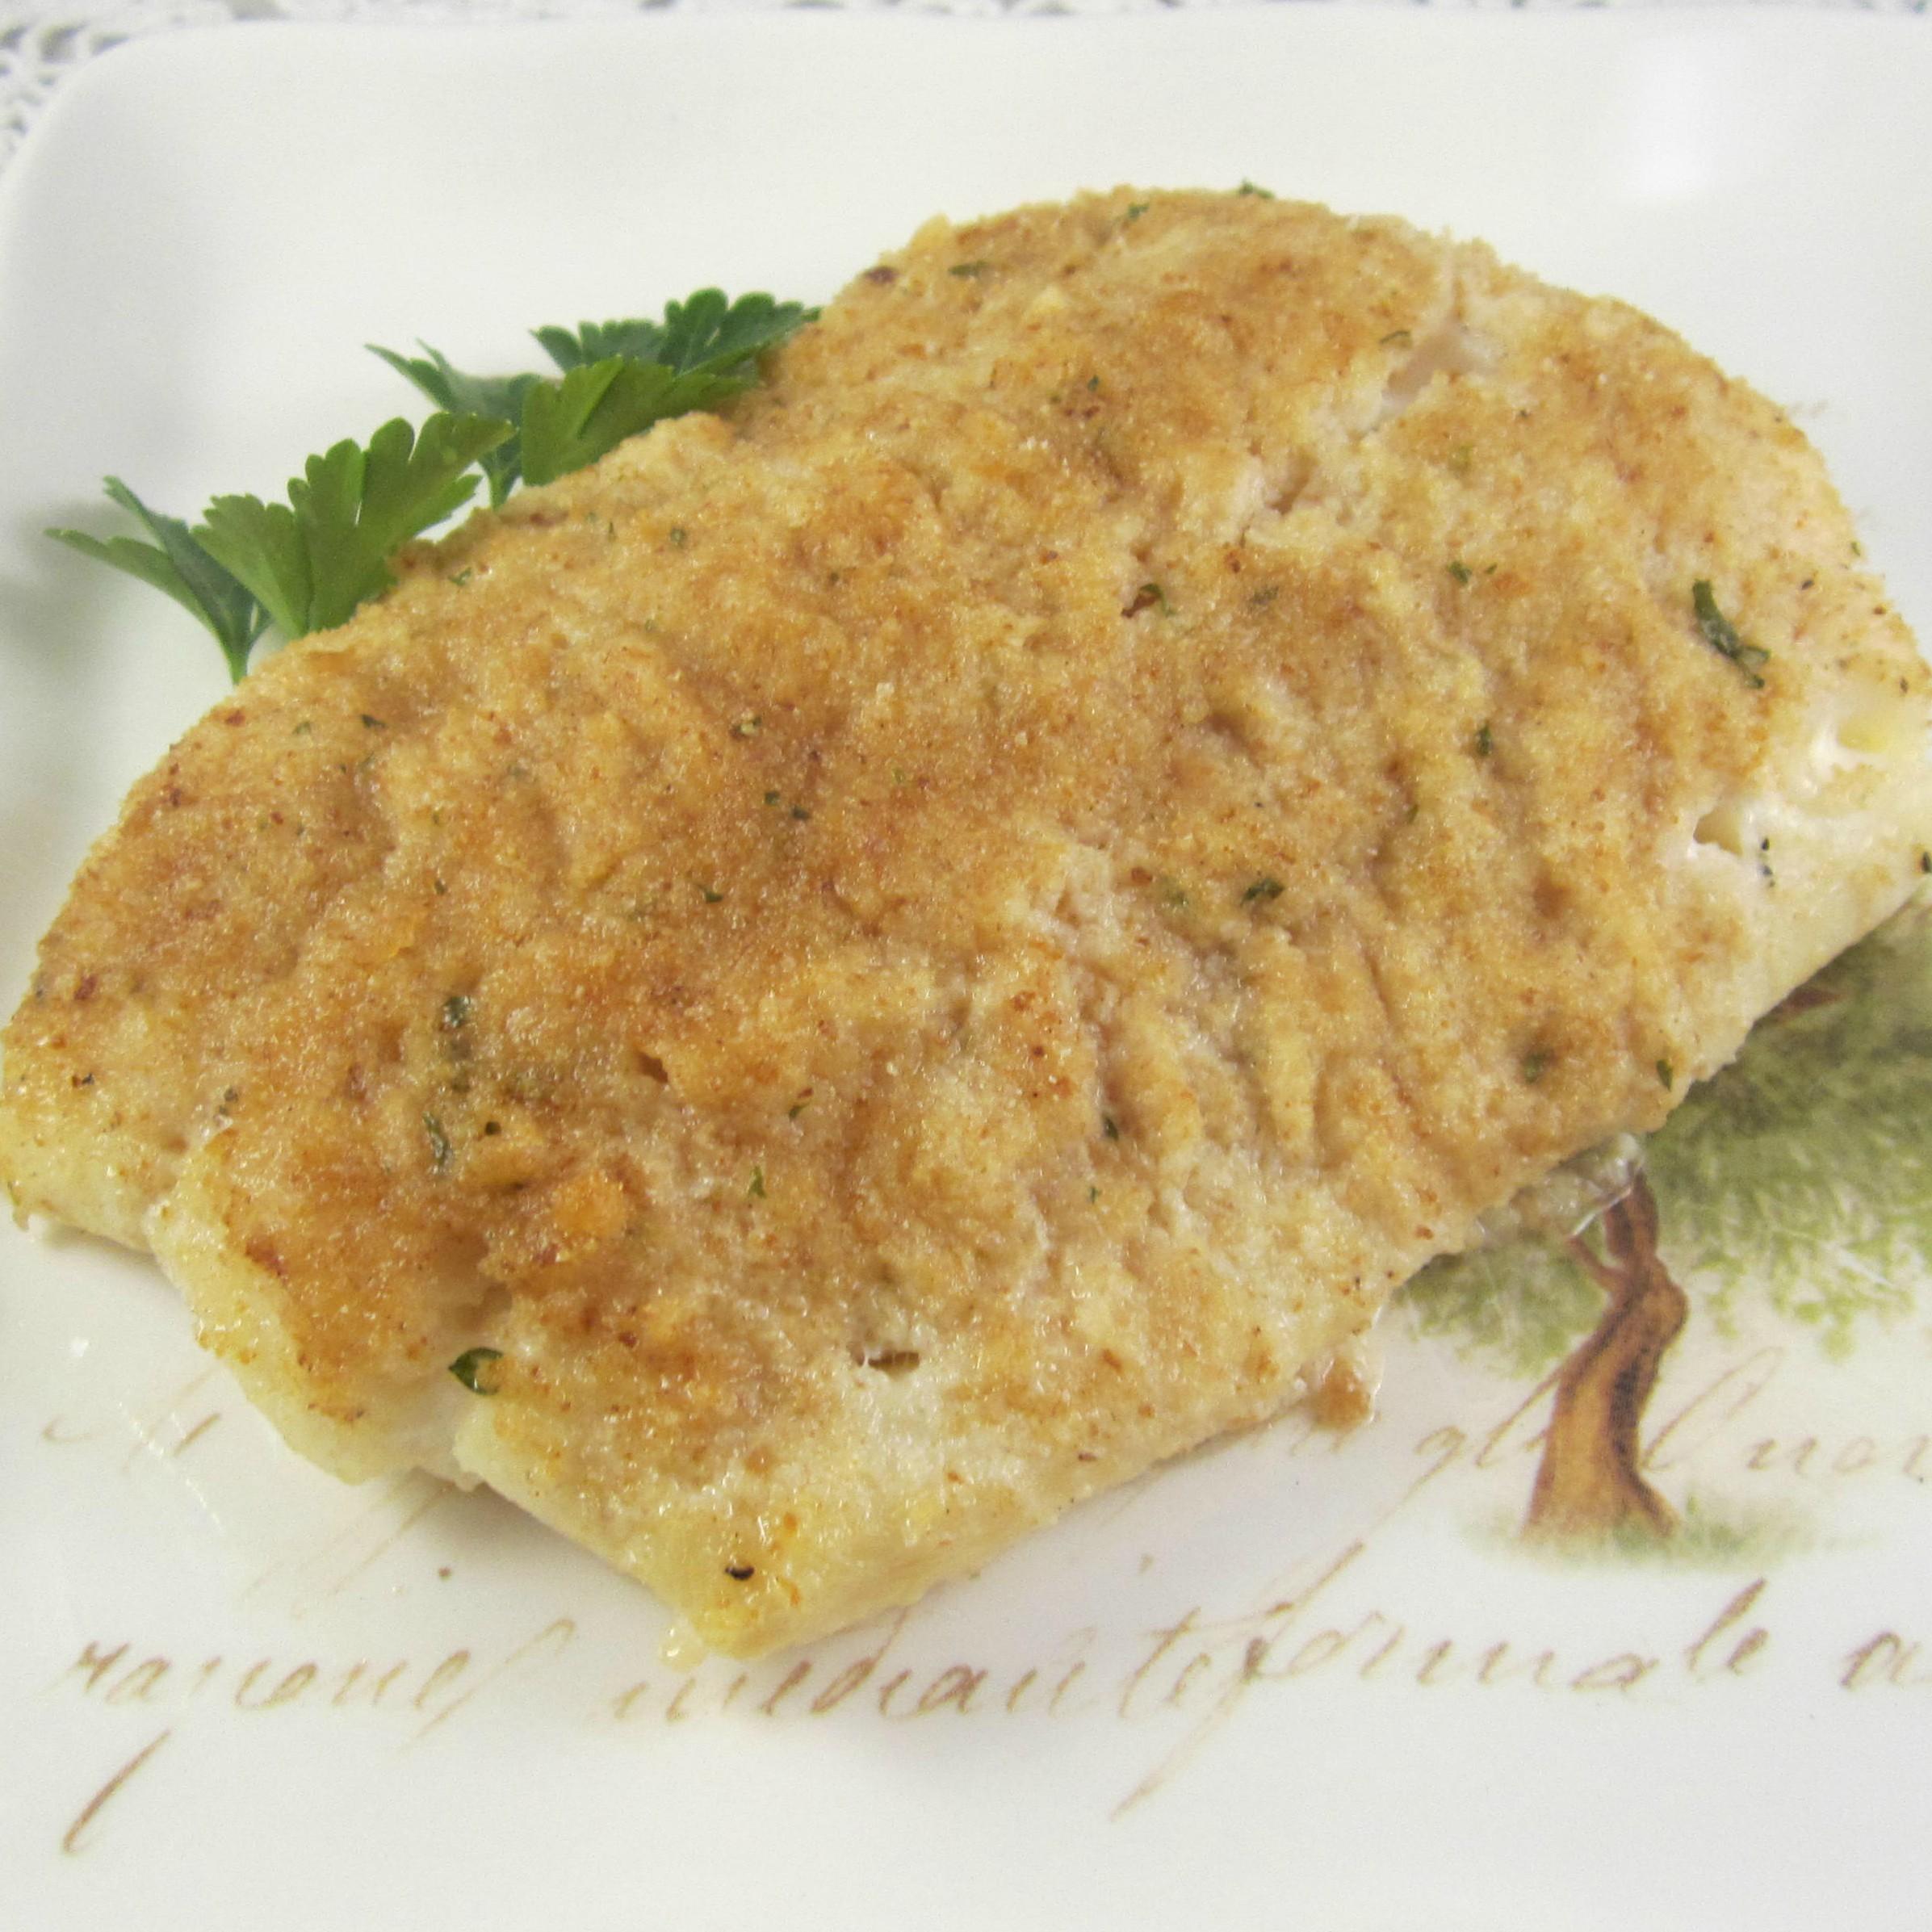 Easy, Excellent Baked Flounder Deb C